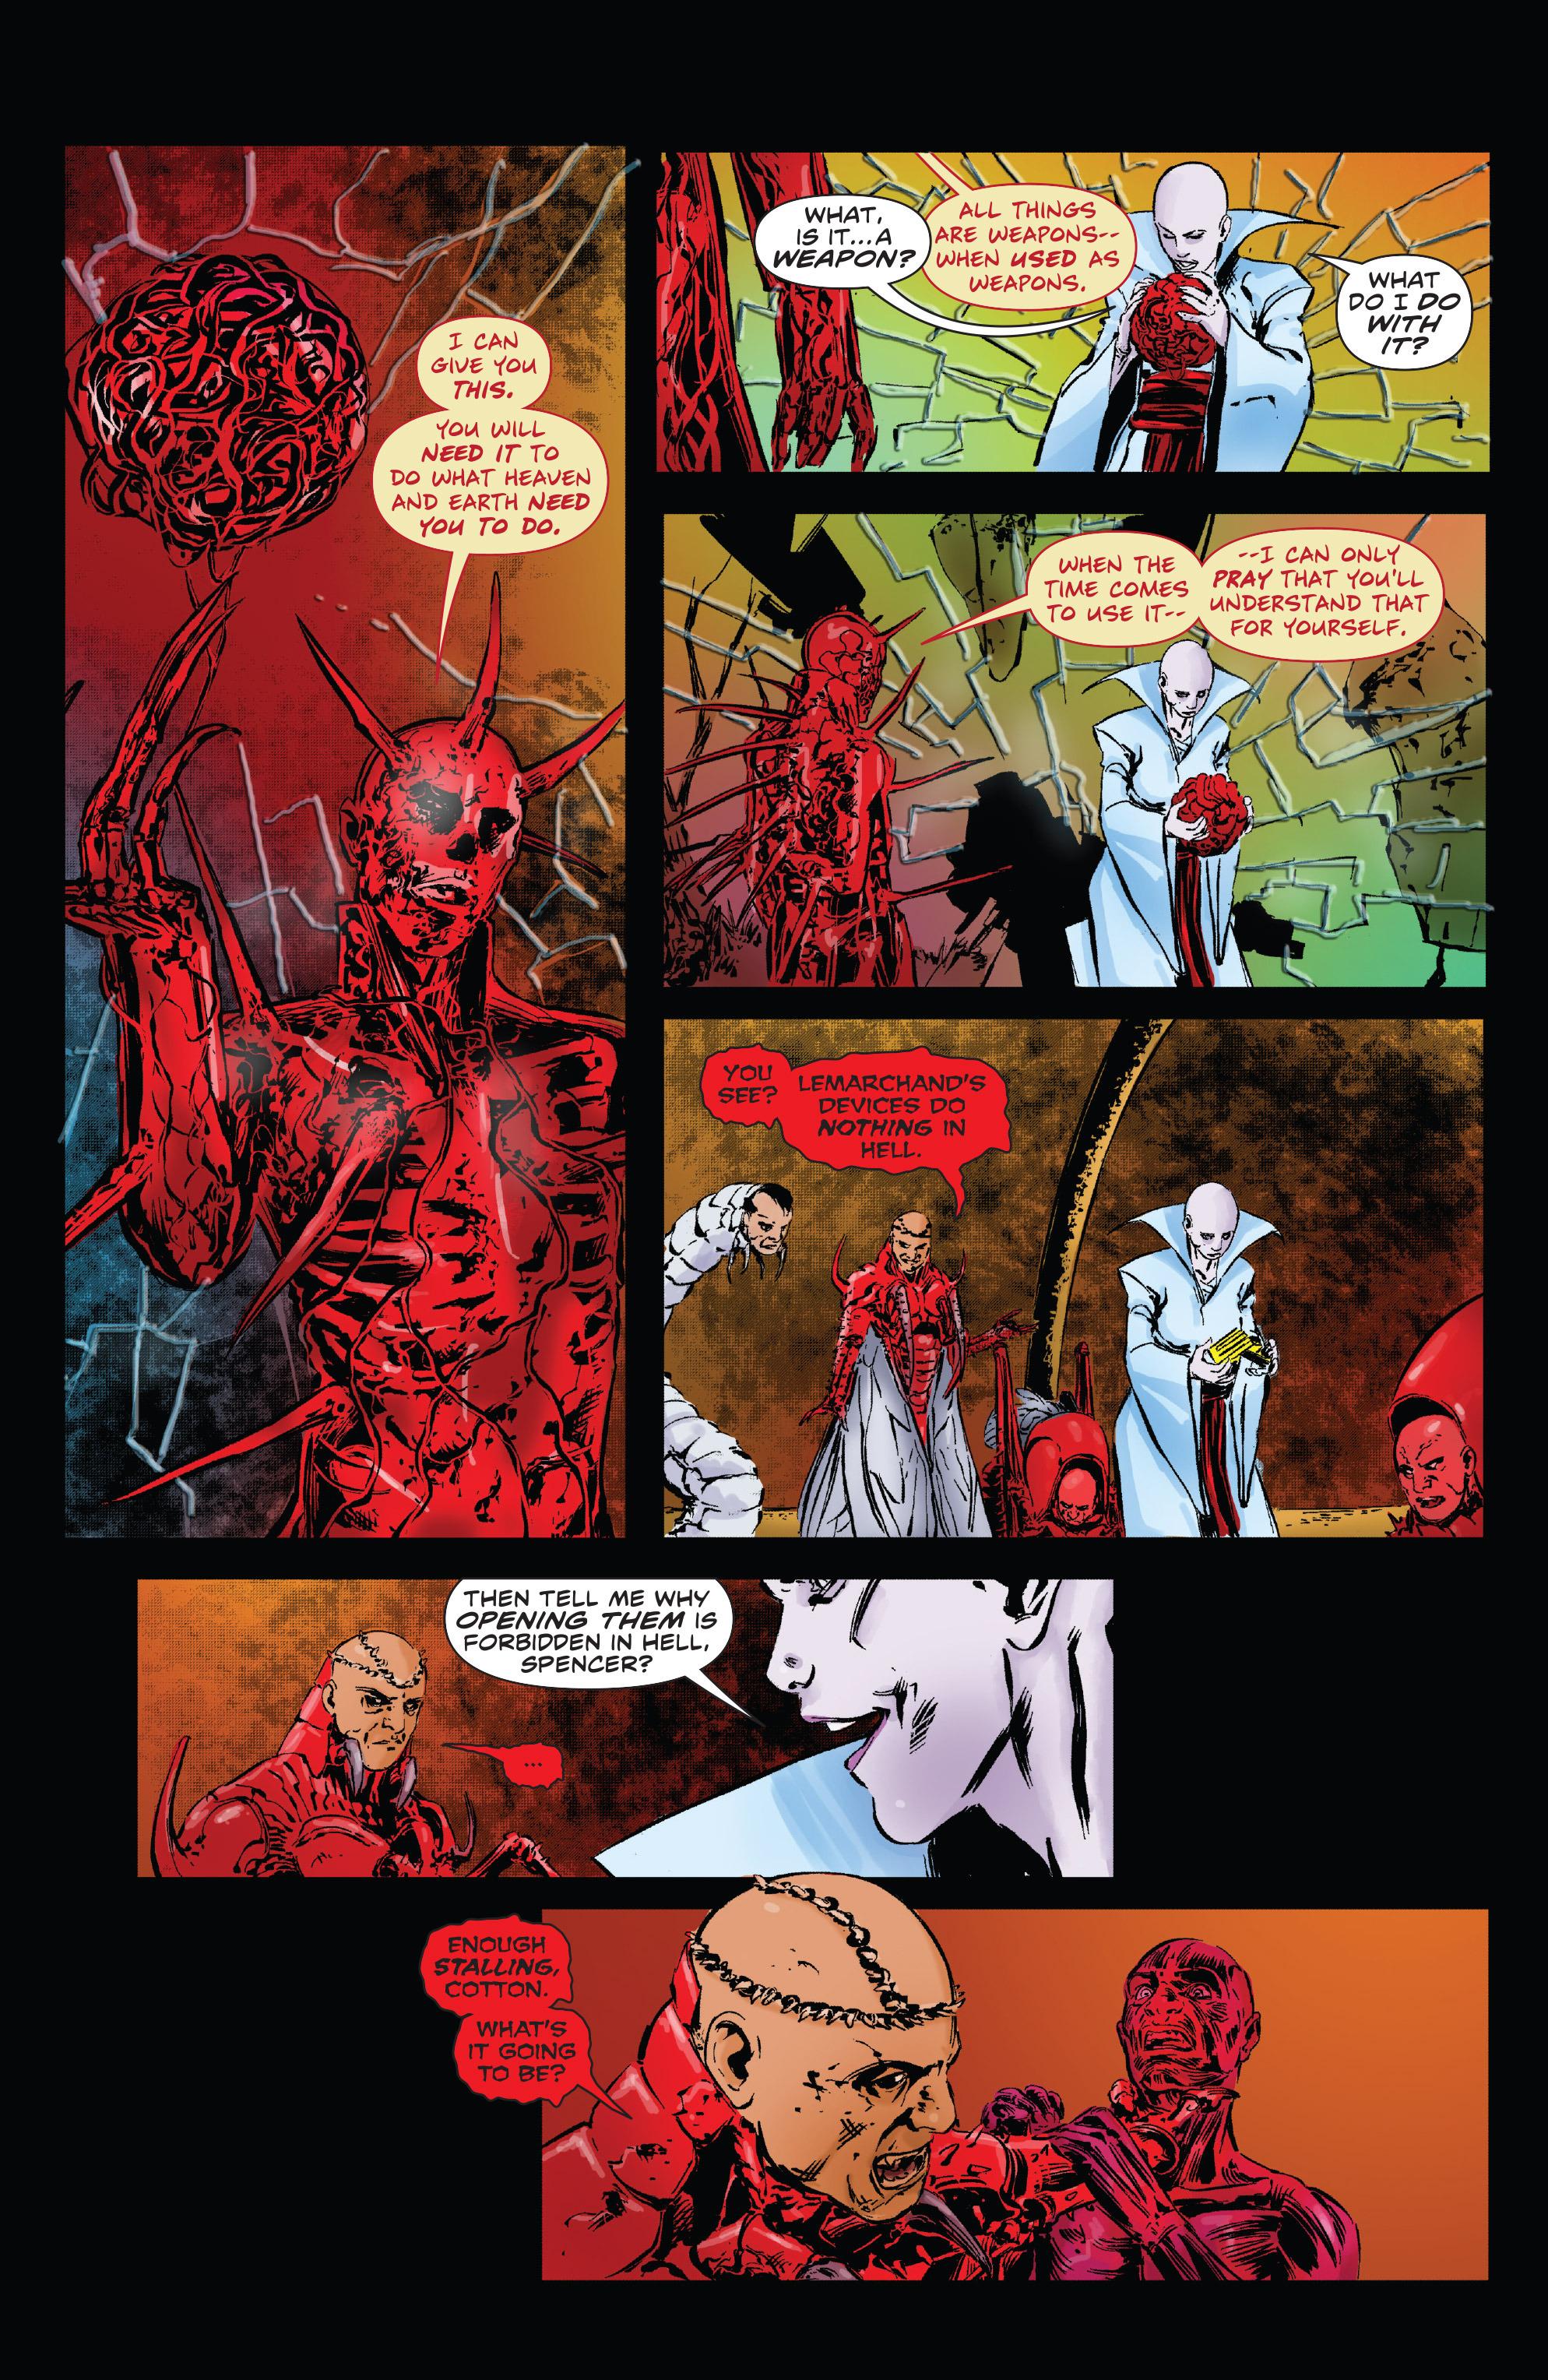 Read online Clive Barker's Hellraiser: The Dark Watch comic -  Issue # TPB 3 - 103